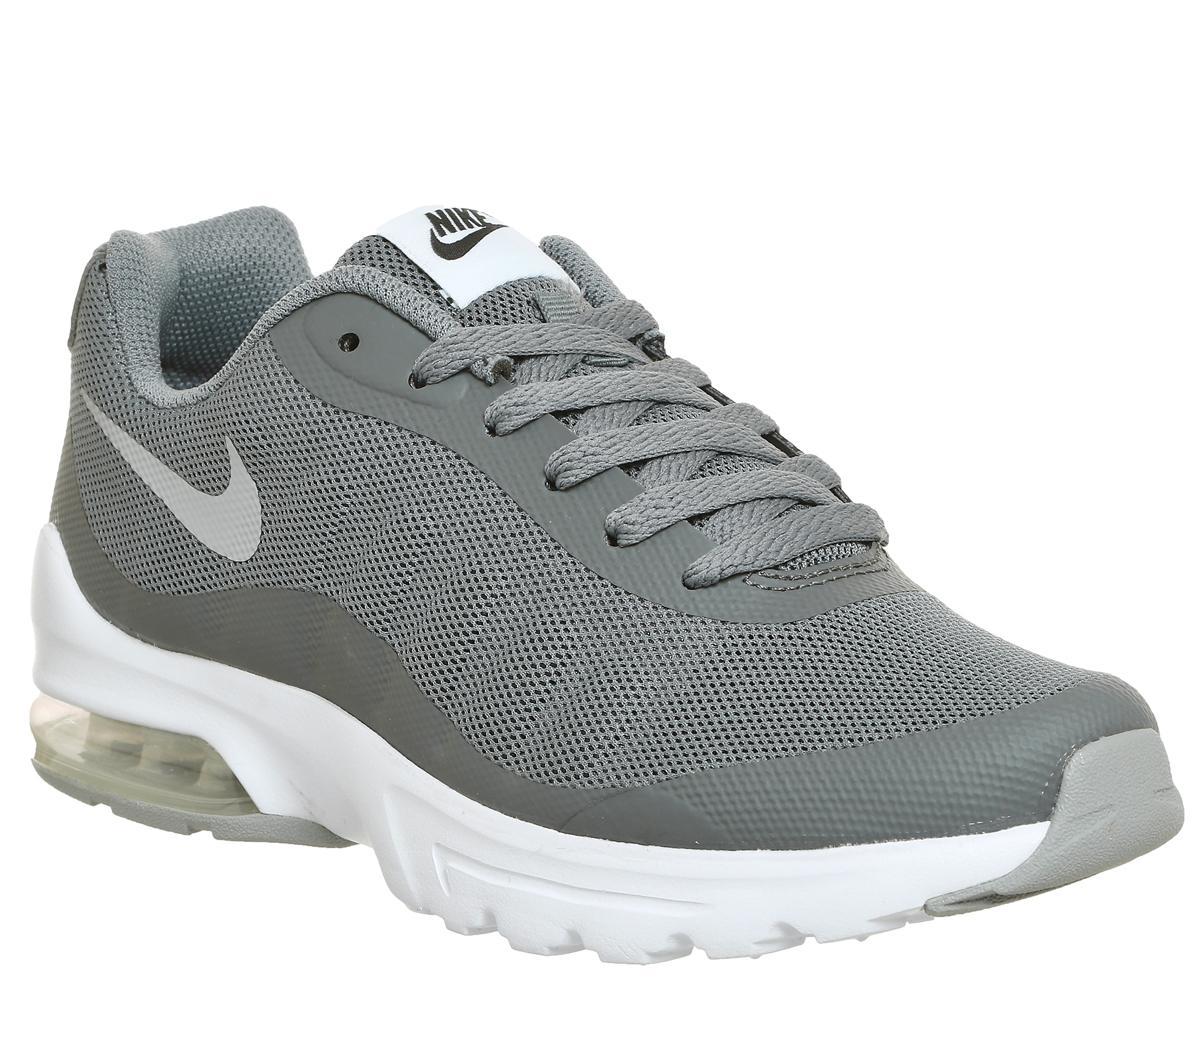 Nike Air Max Invigor Trainers Cool Grey